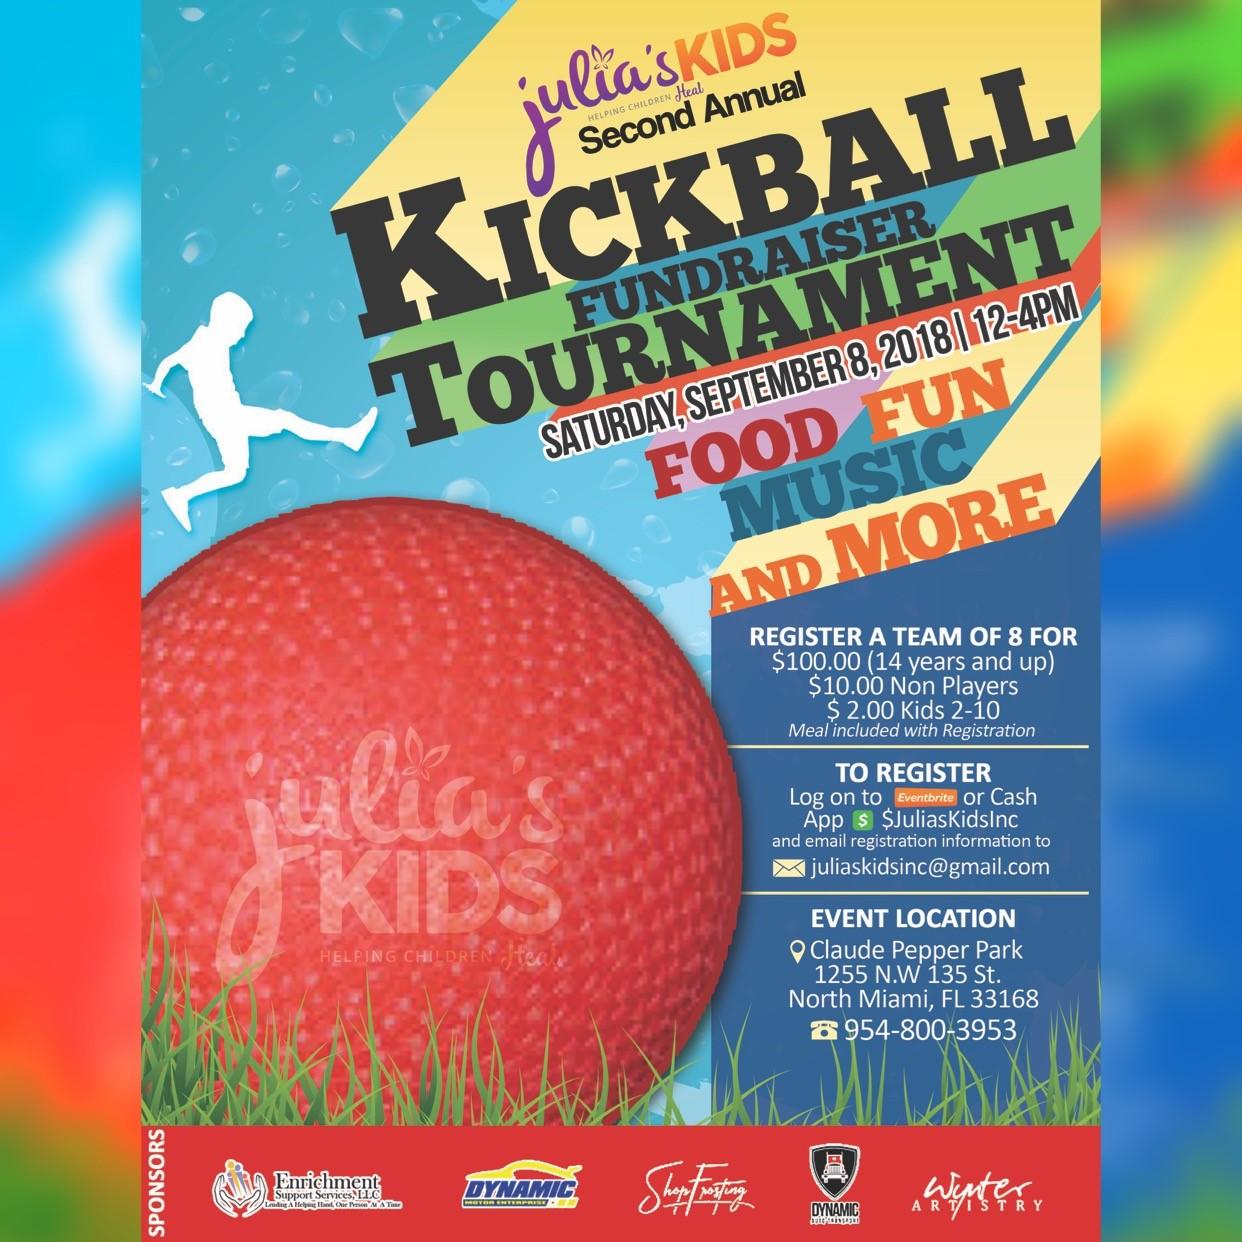 Julia's Kids 2nd Annual Kickball Fundraiser Tournament